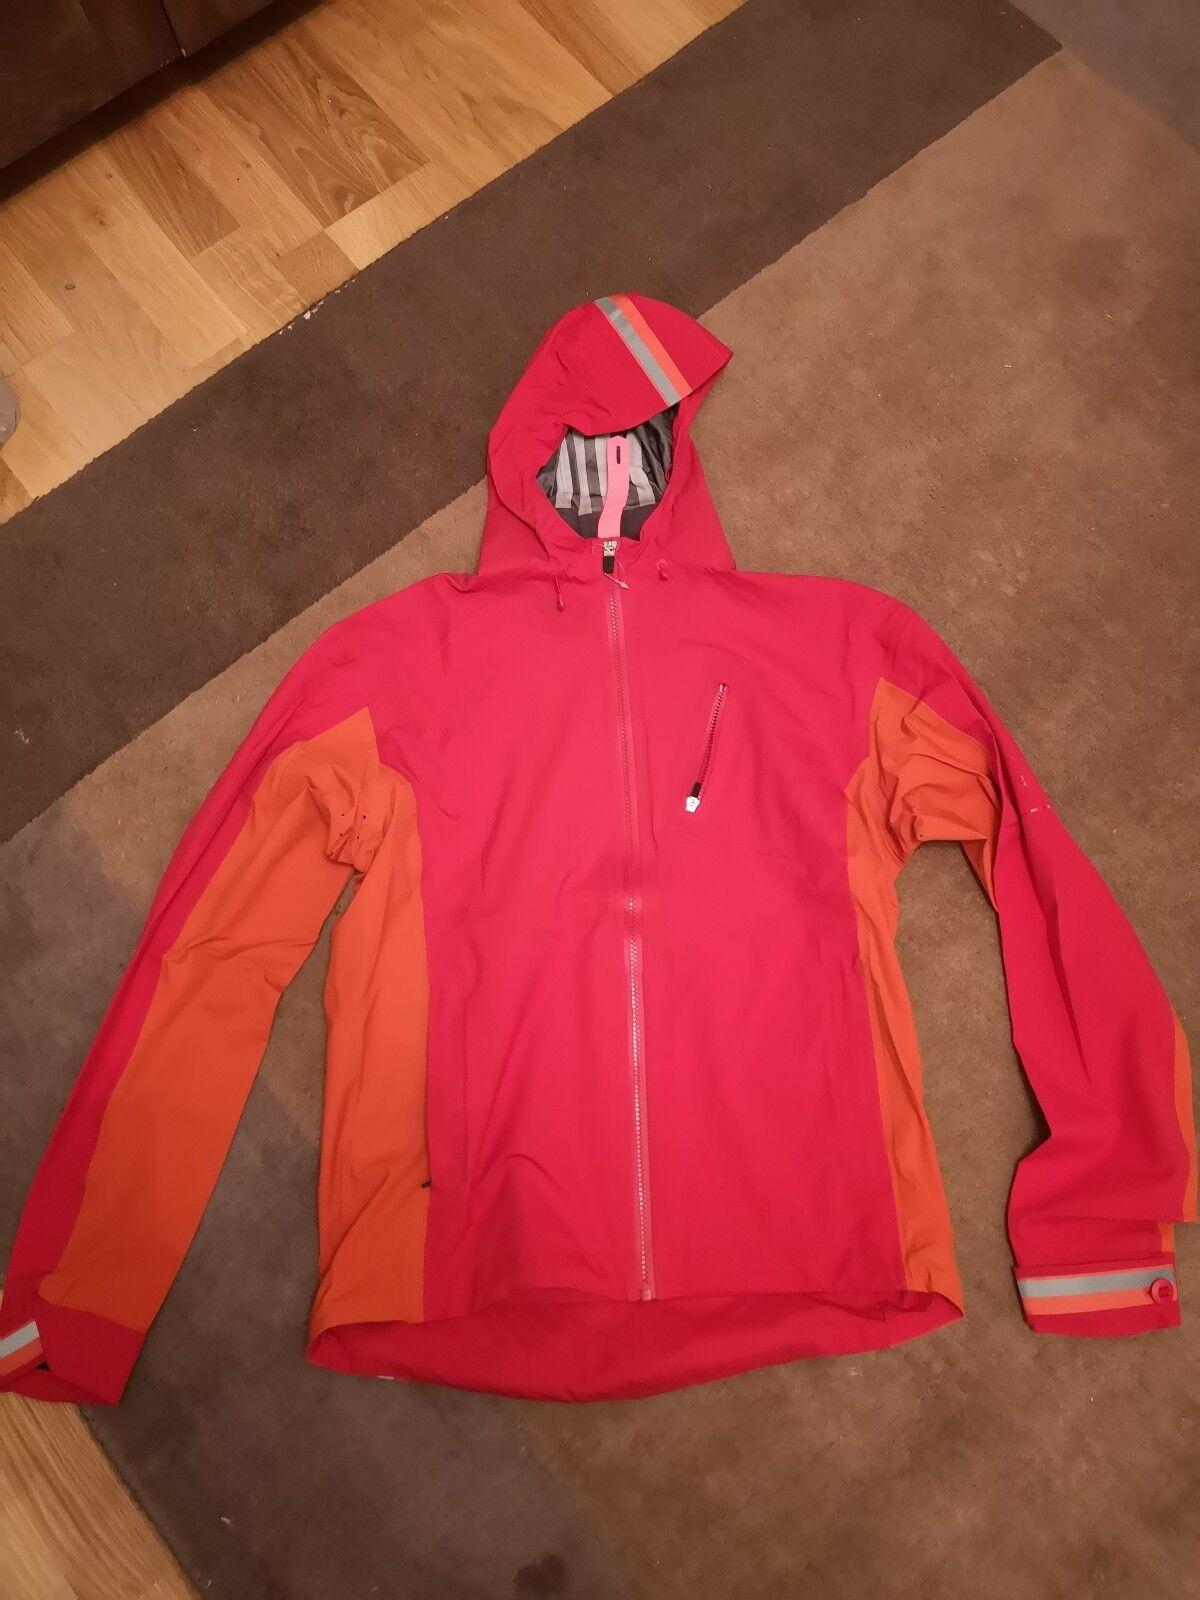 New RAPHA Hooded Rain Jacket Größe M Rrp  stc7650